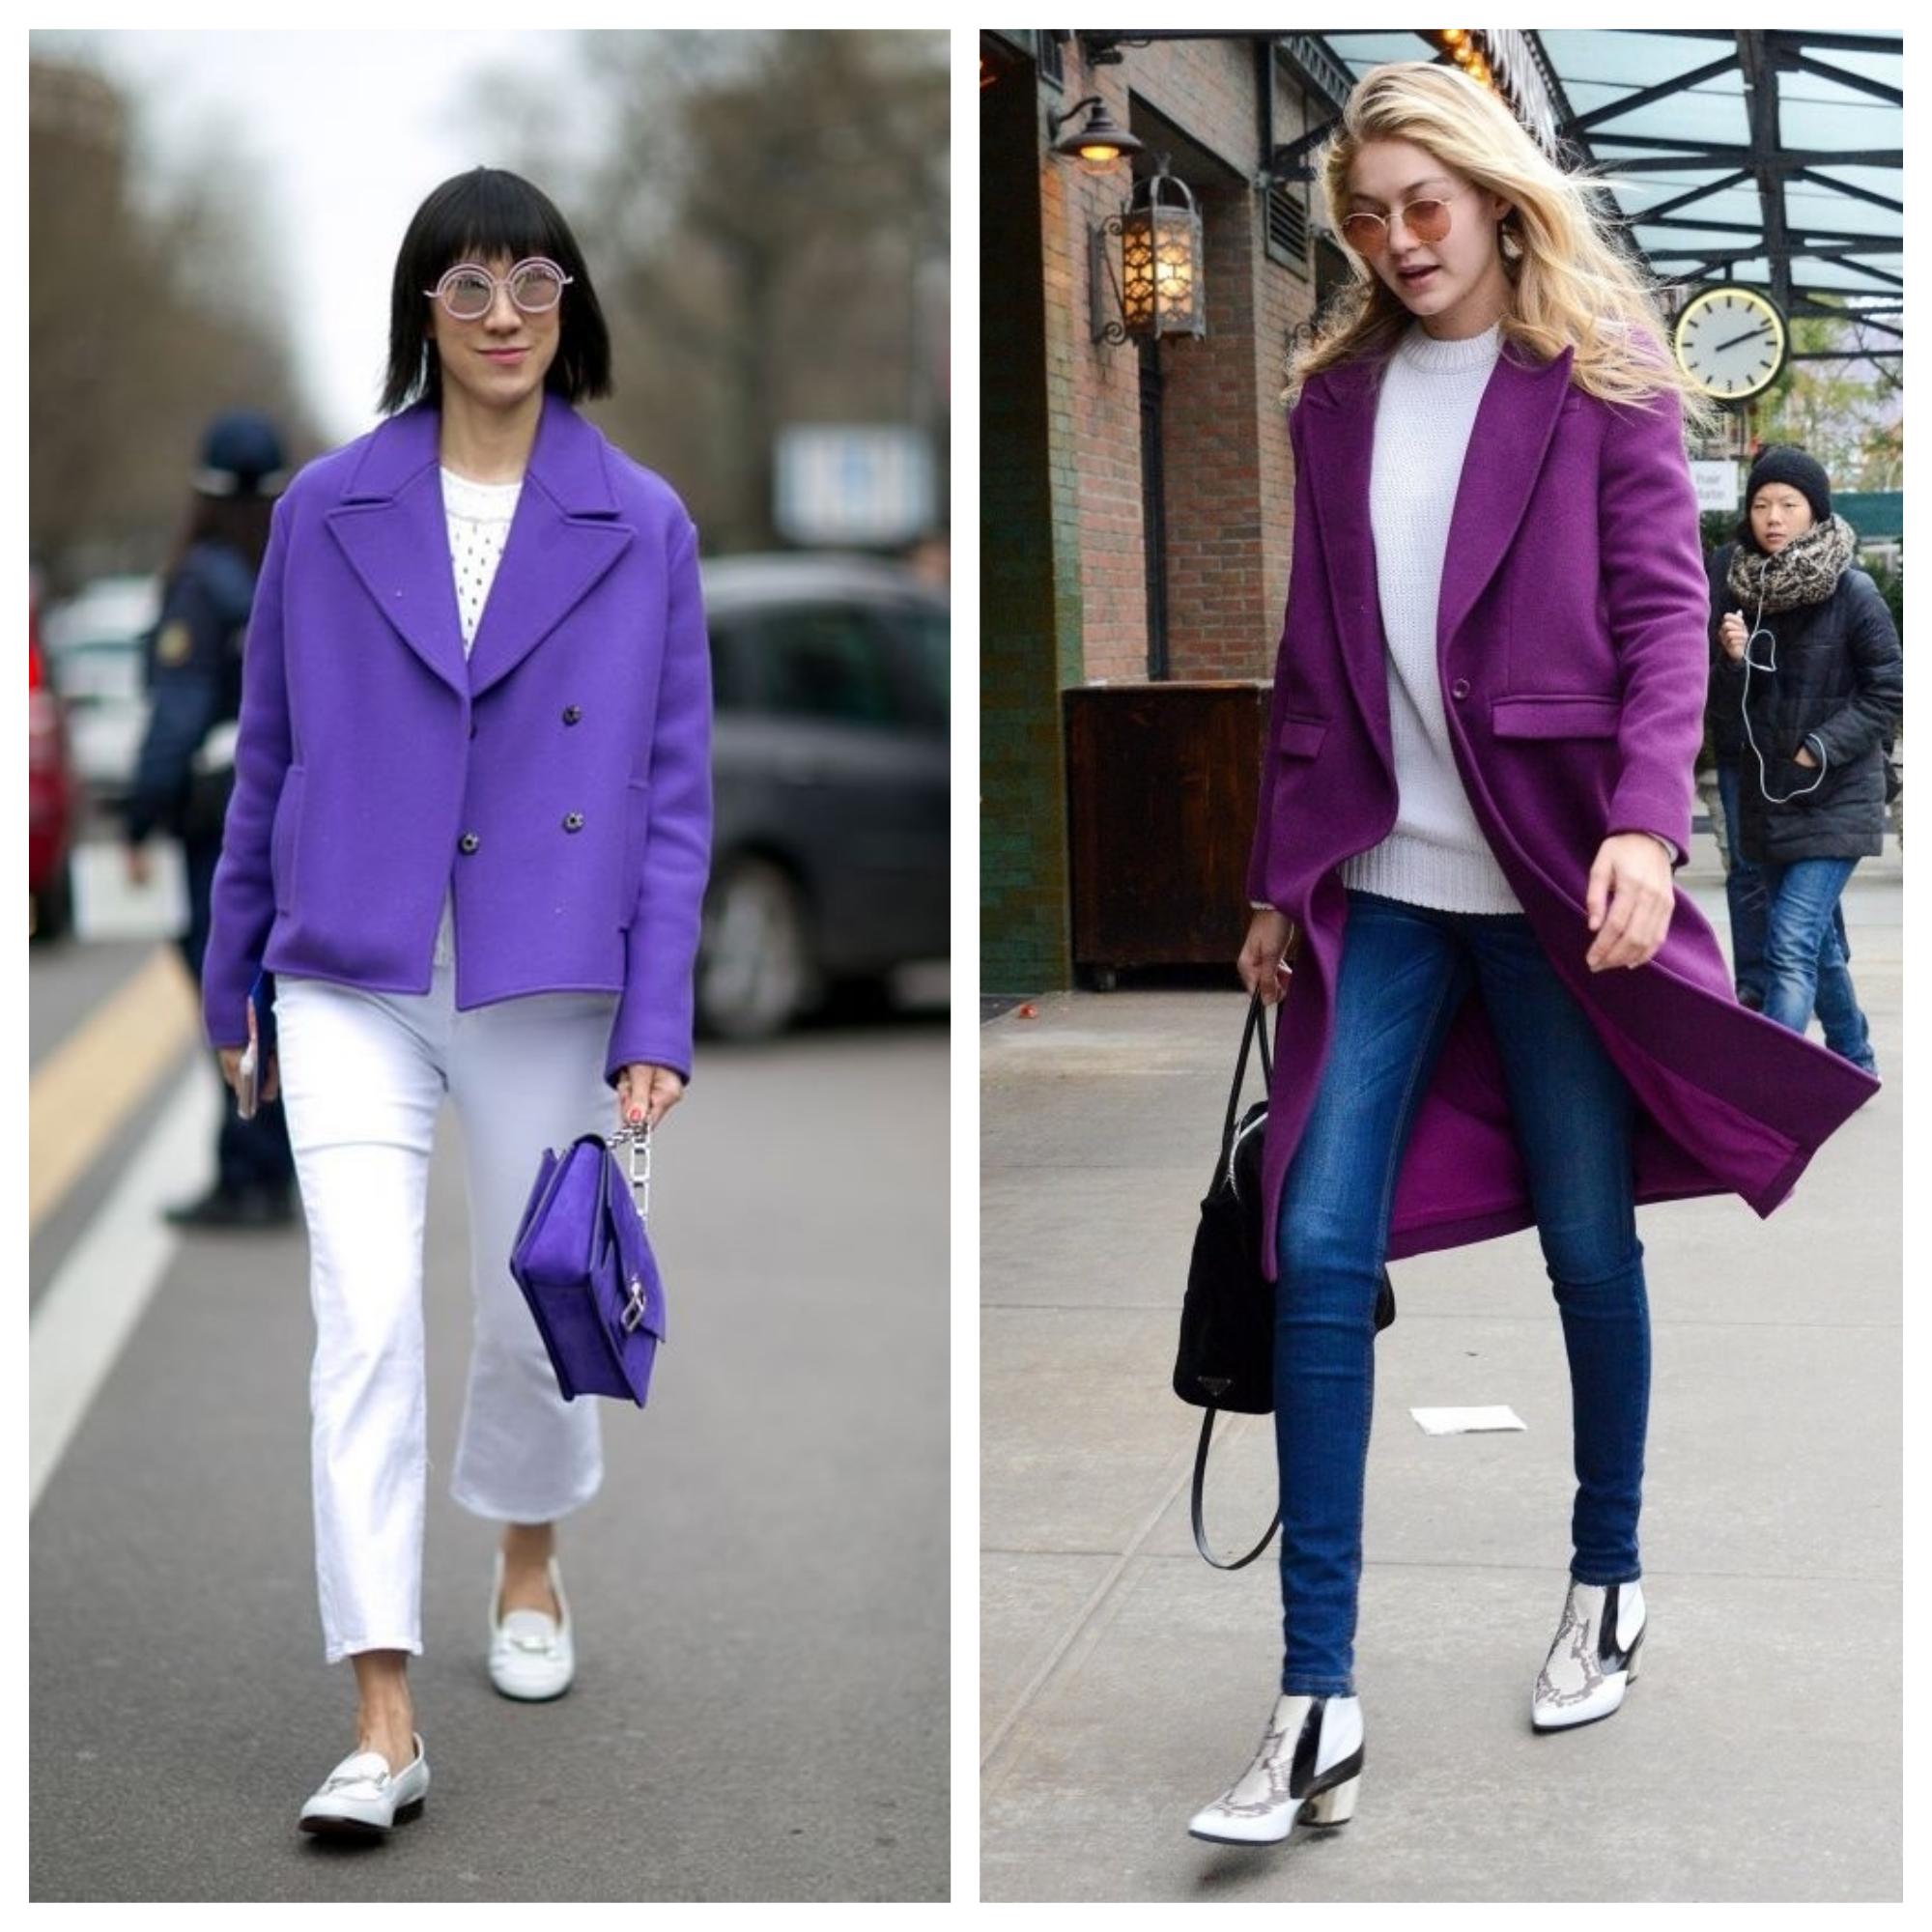 ultra violet casacos